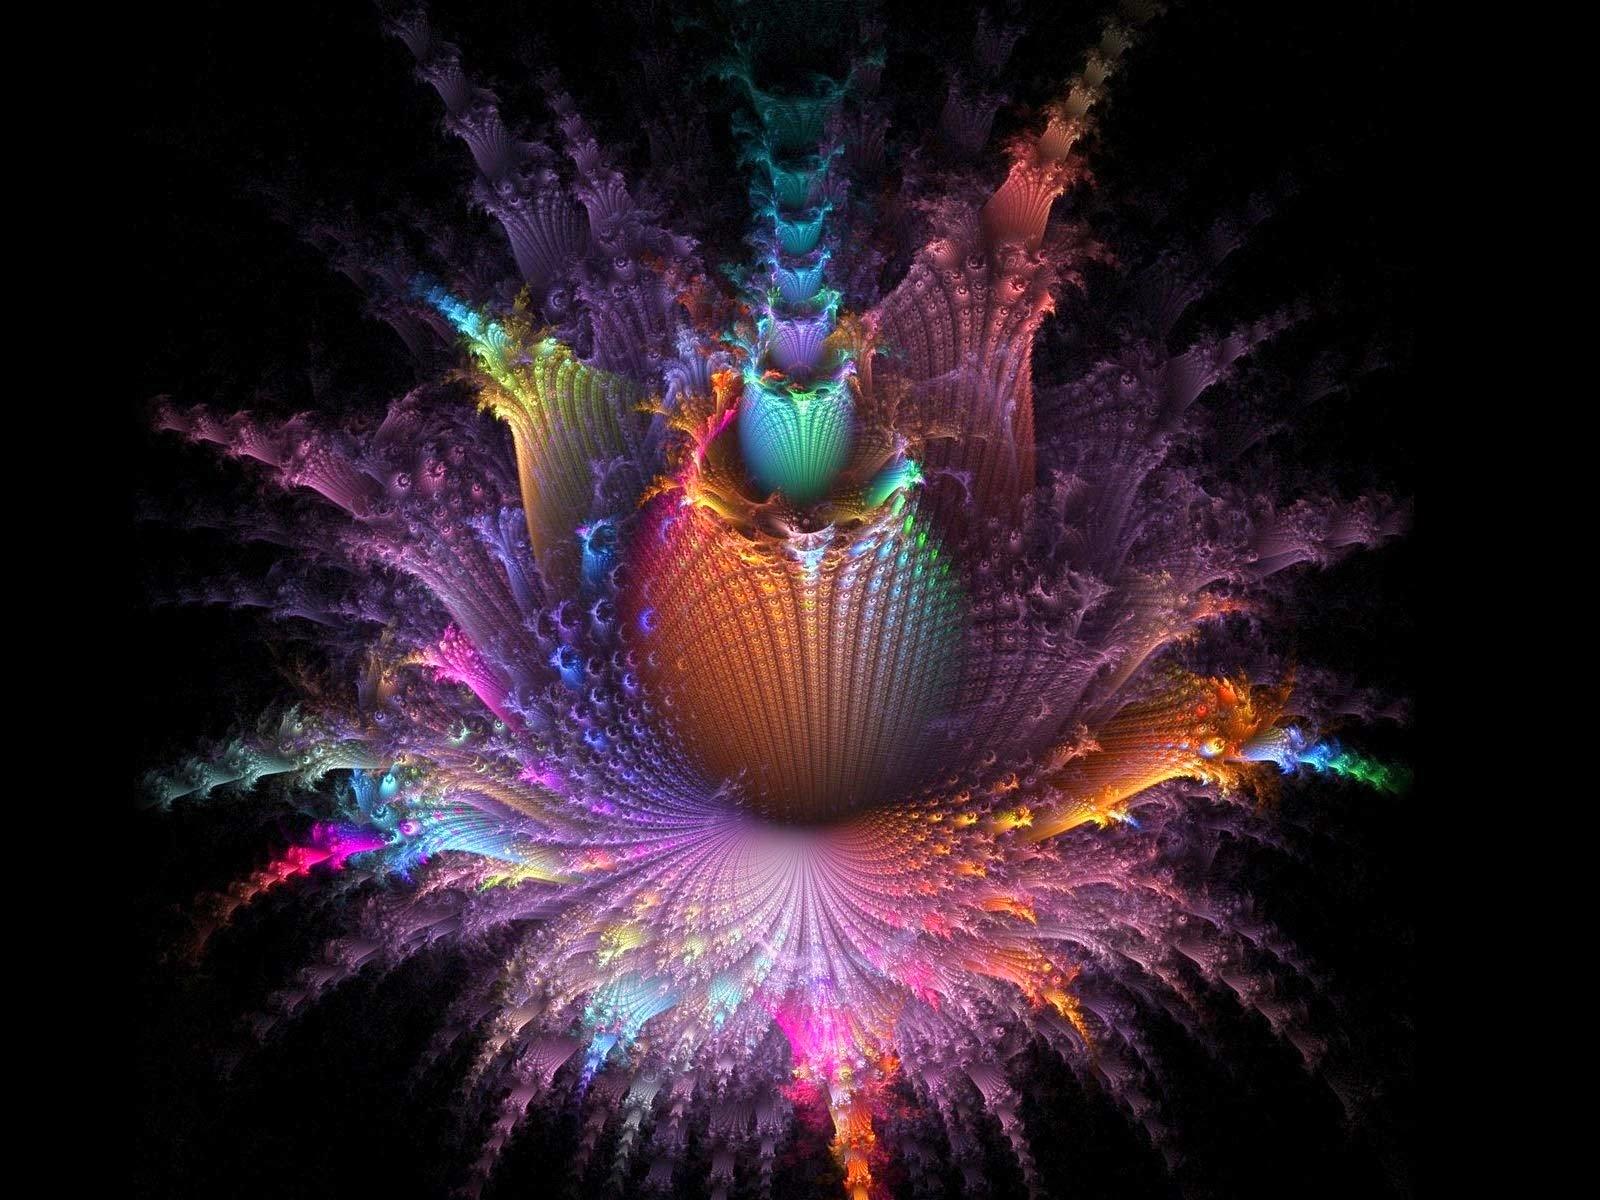 Fractal Art Colorful Desktop Wallpaper